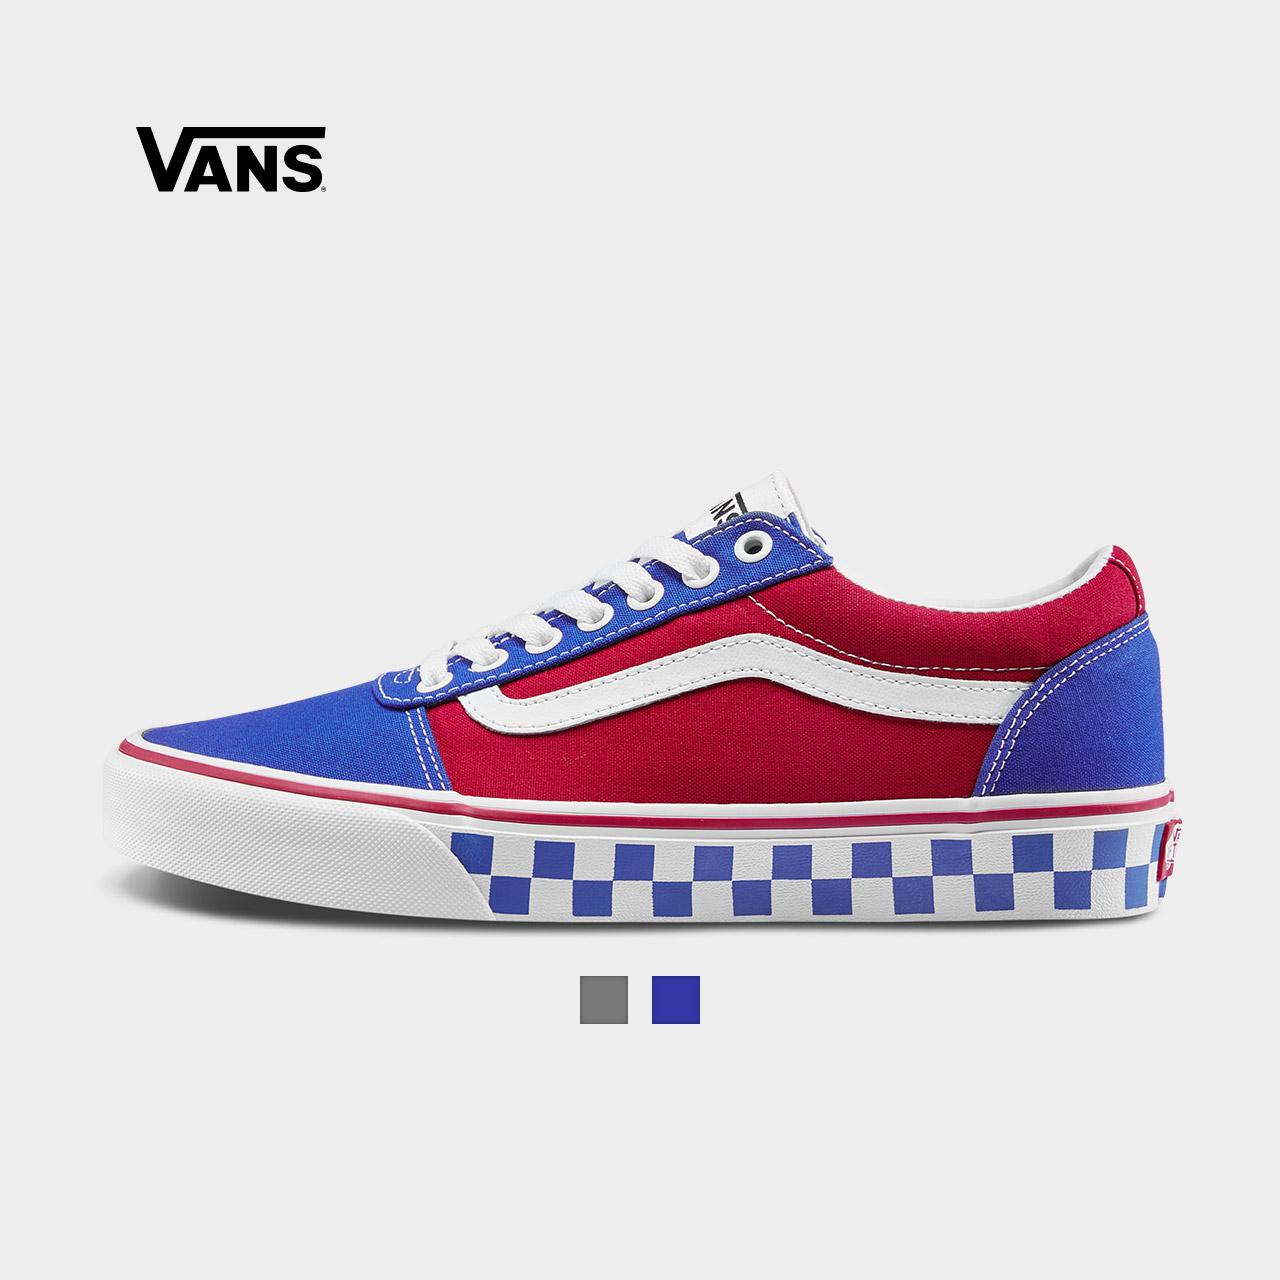 Vans范斯 运动休闲系列 帆布鞋 低帮男子新款侧边条纹官方正品